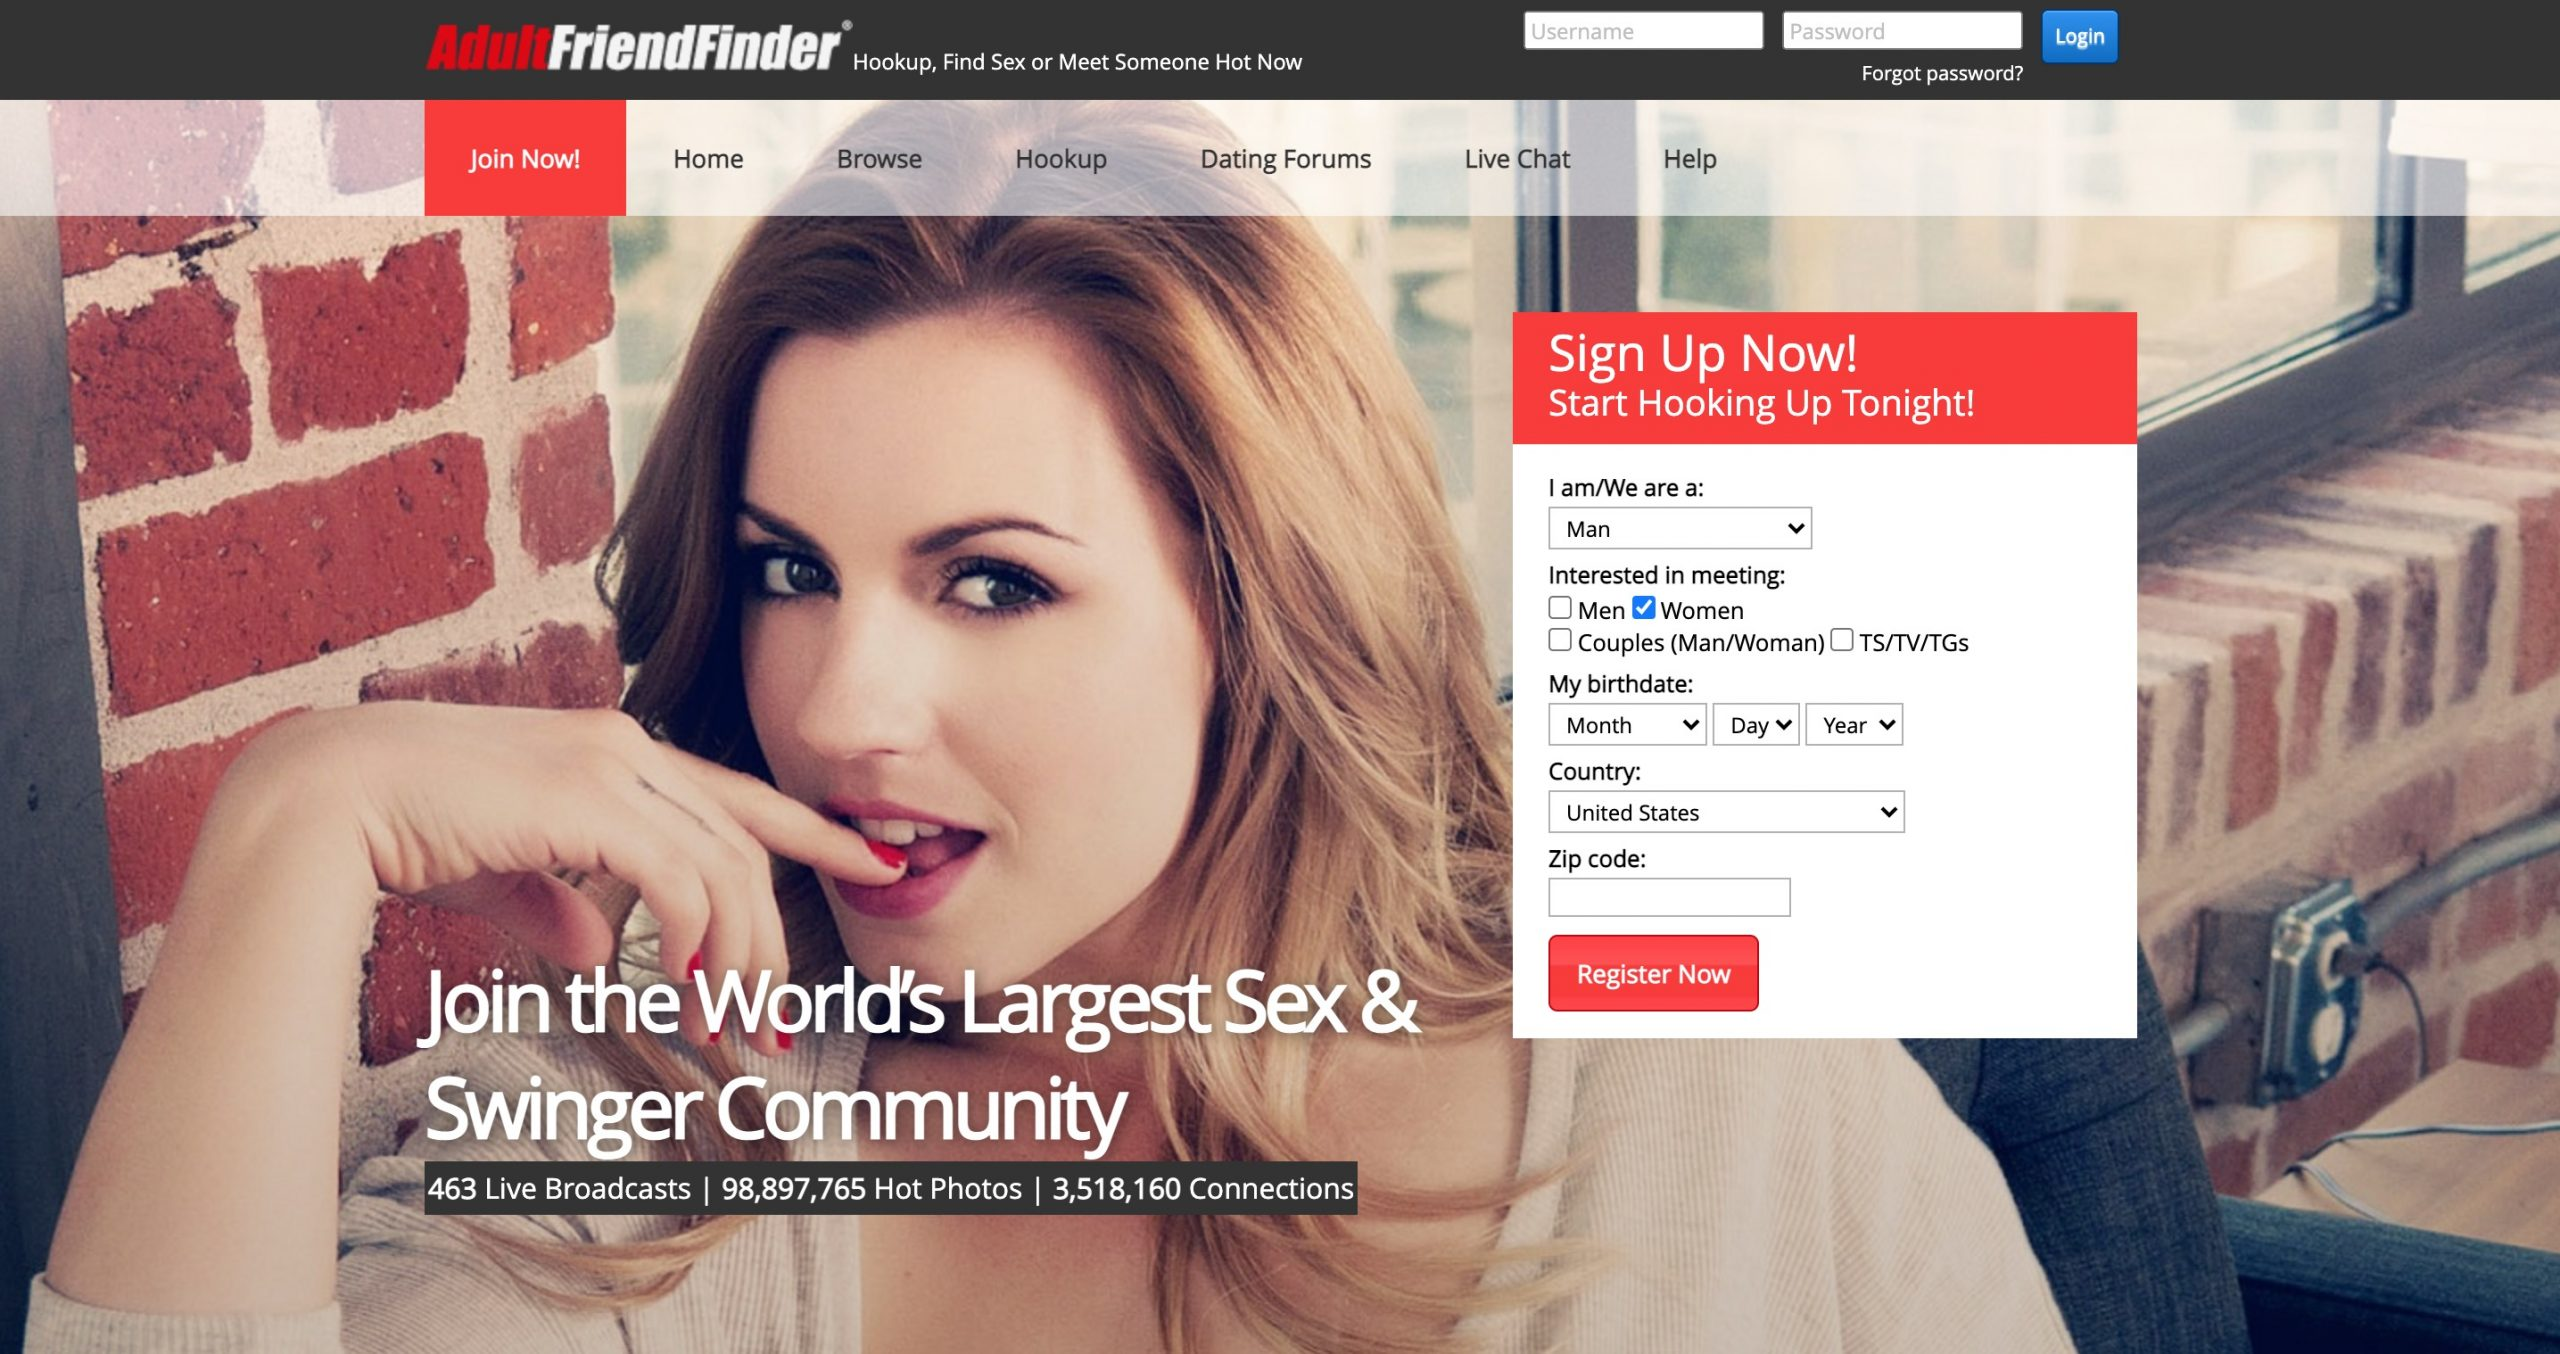 Pagina principale di AdultFriendFinder